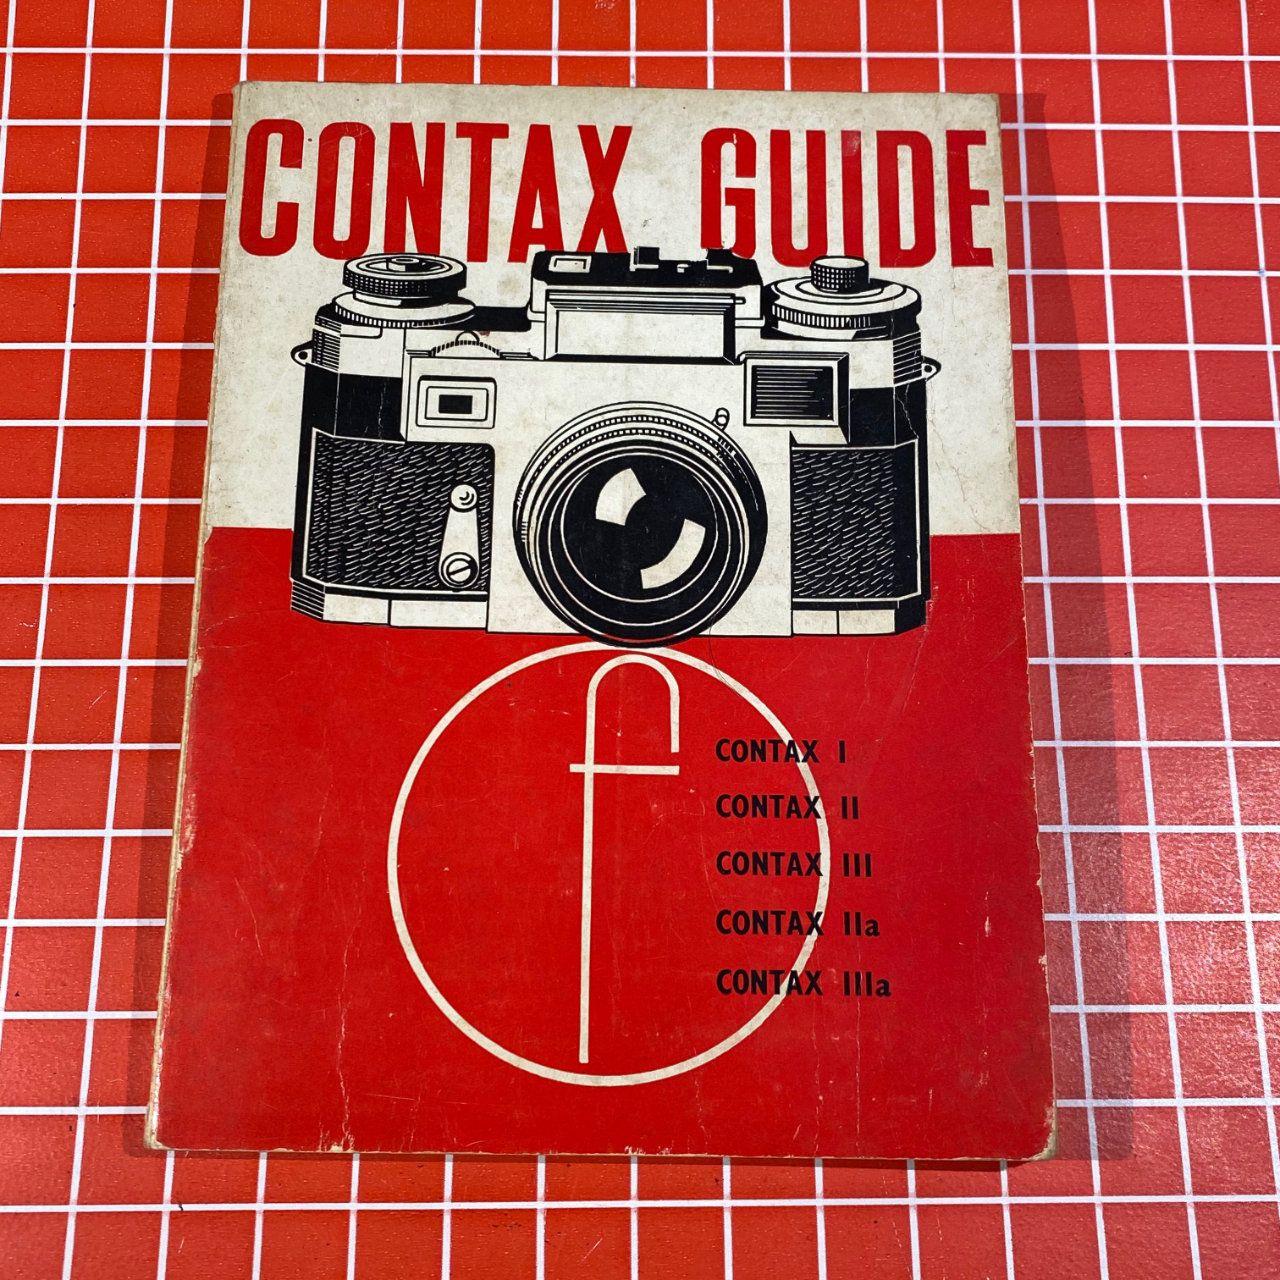 Vintage 1966 Focal Camera 35mm Film Guide by DeutschePost on Etsy